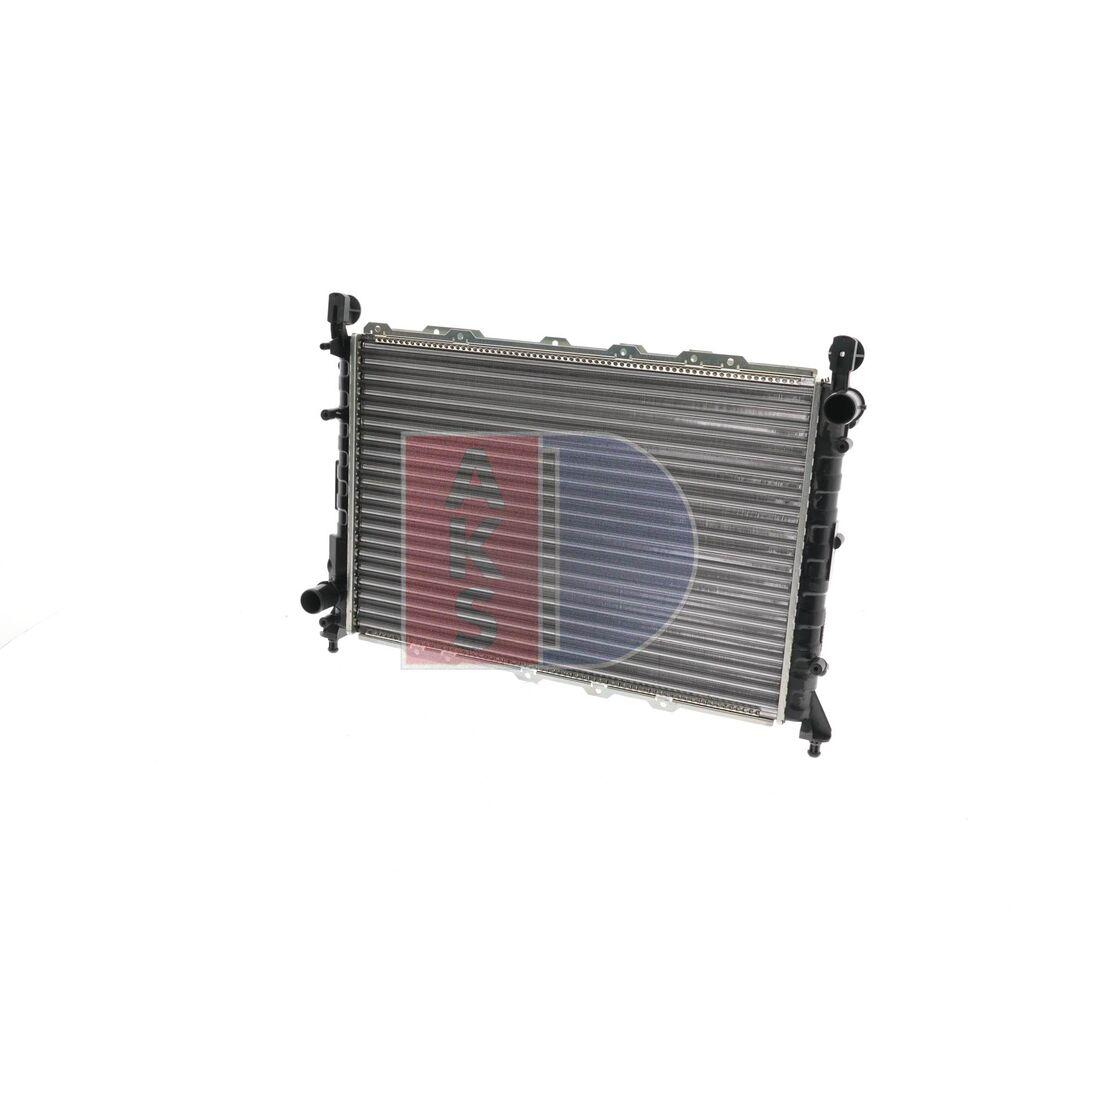 Kühler, Motorkühlung -- AKS DASIS, ALFA ROMEO, 145 (930), 146...